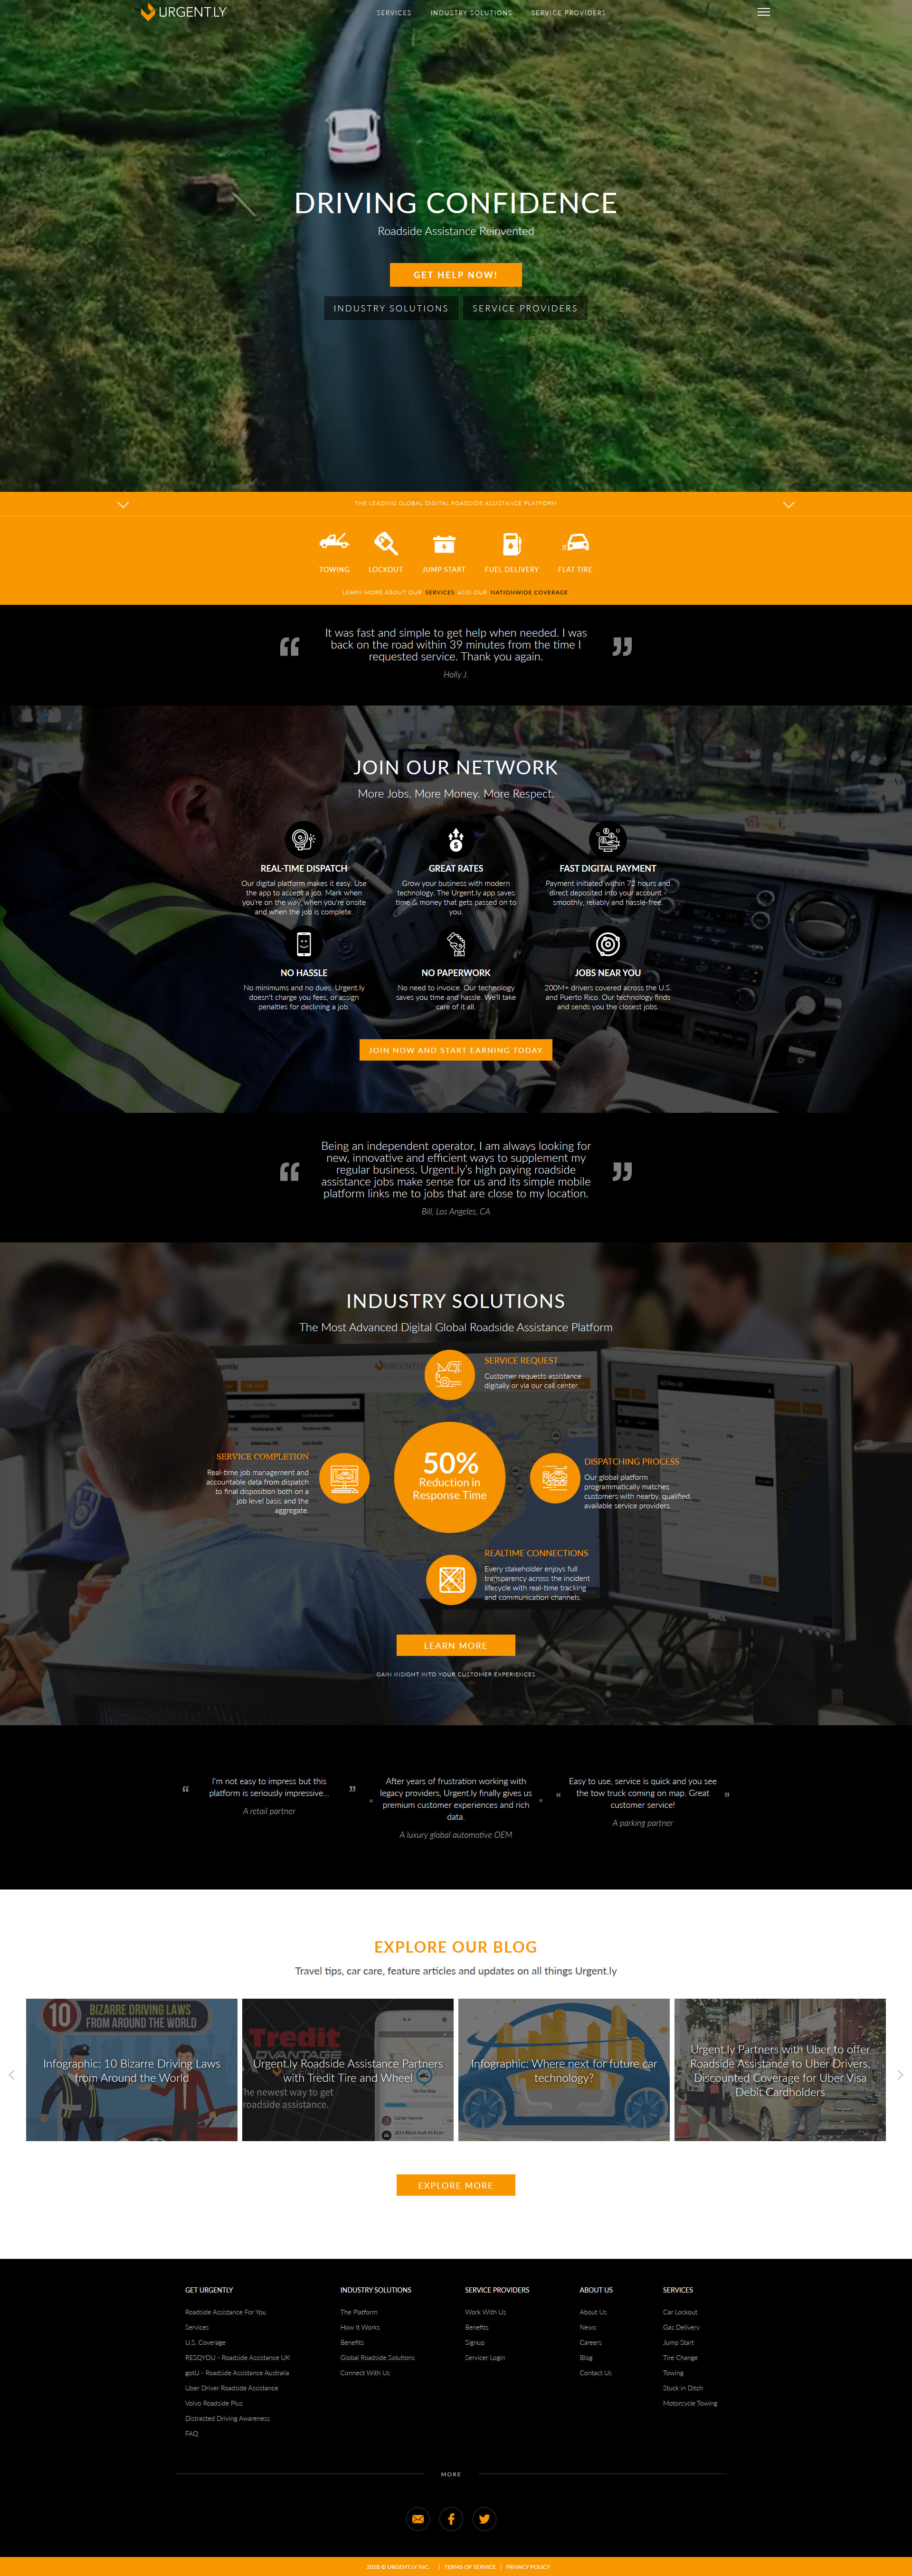 Portfolio Urgently On Demand Road Assistance Oem Audi Wheels Database Web Design Development Hosting Management Graphic Marketing Material Ux Ui Print